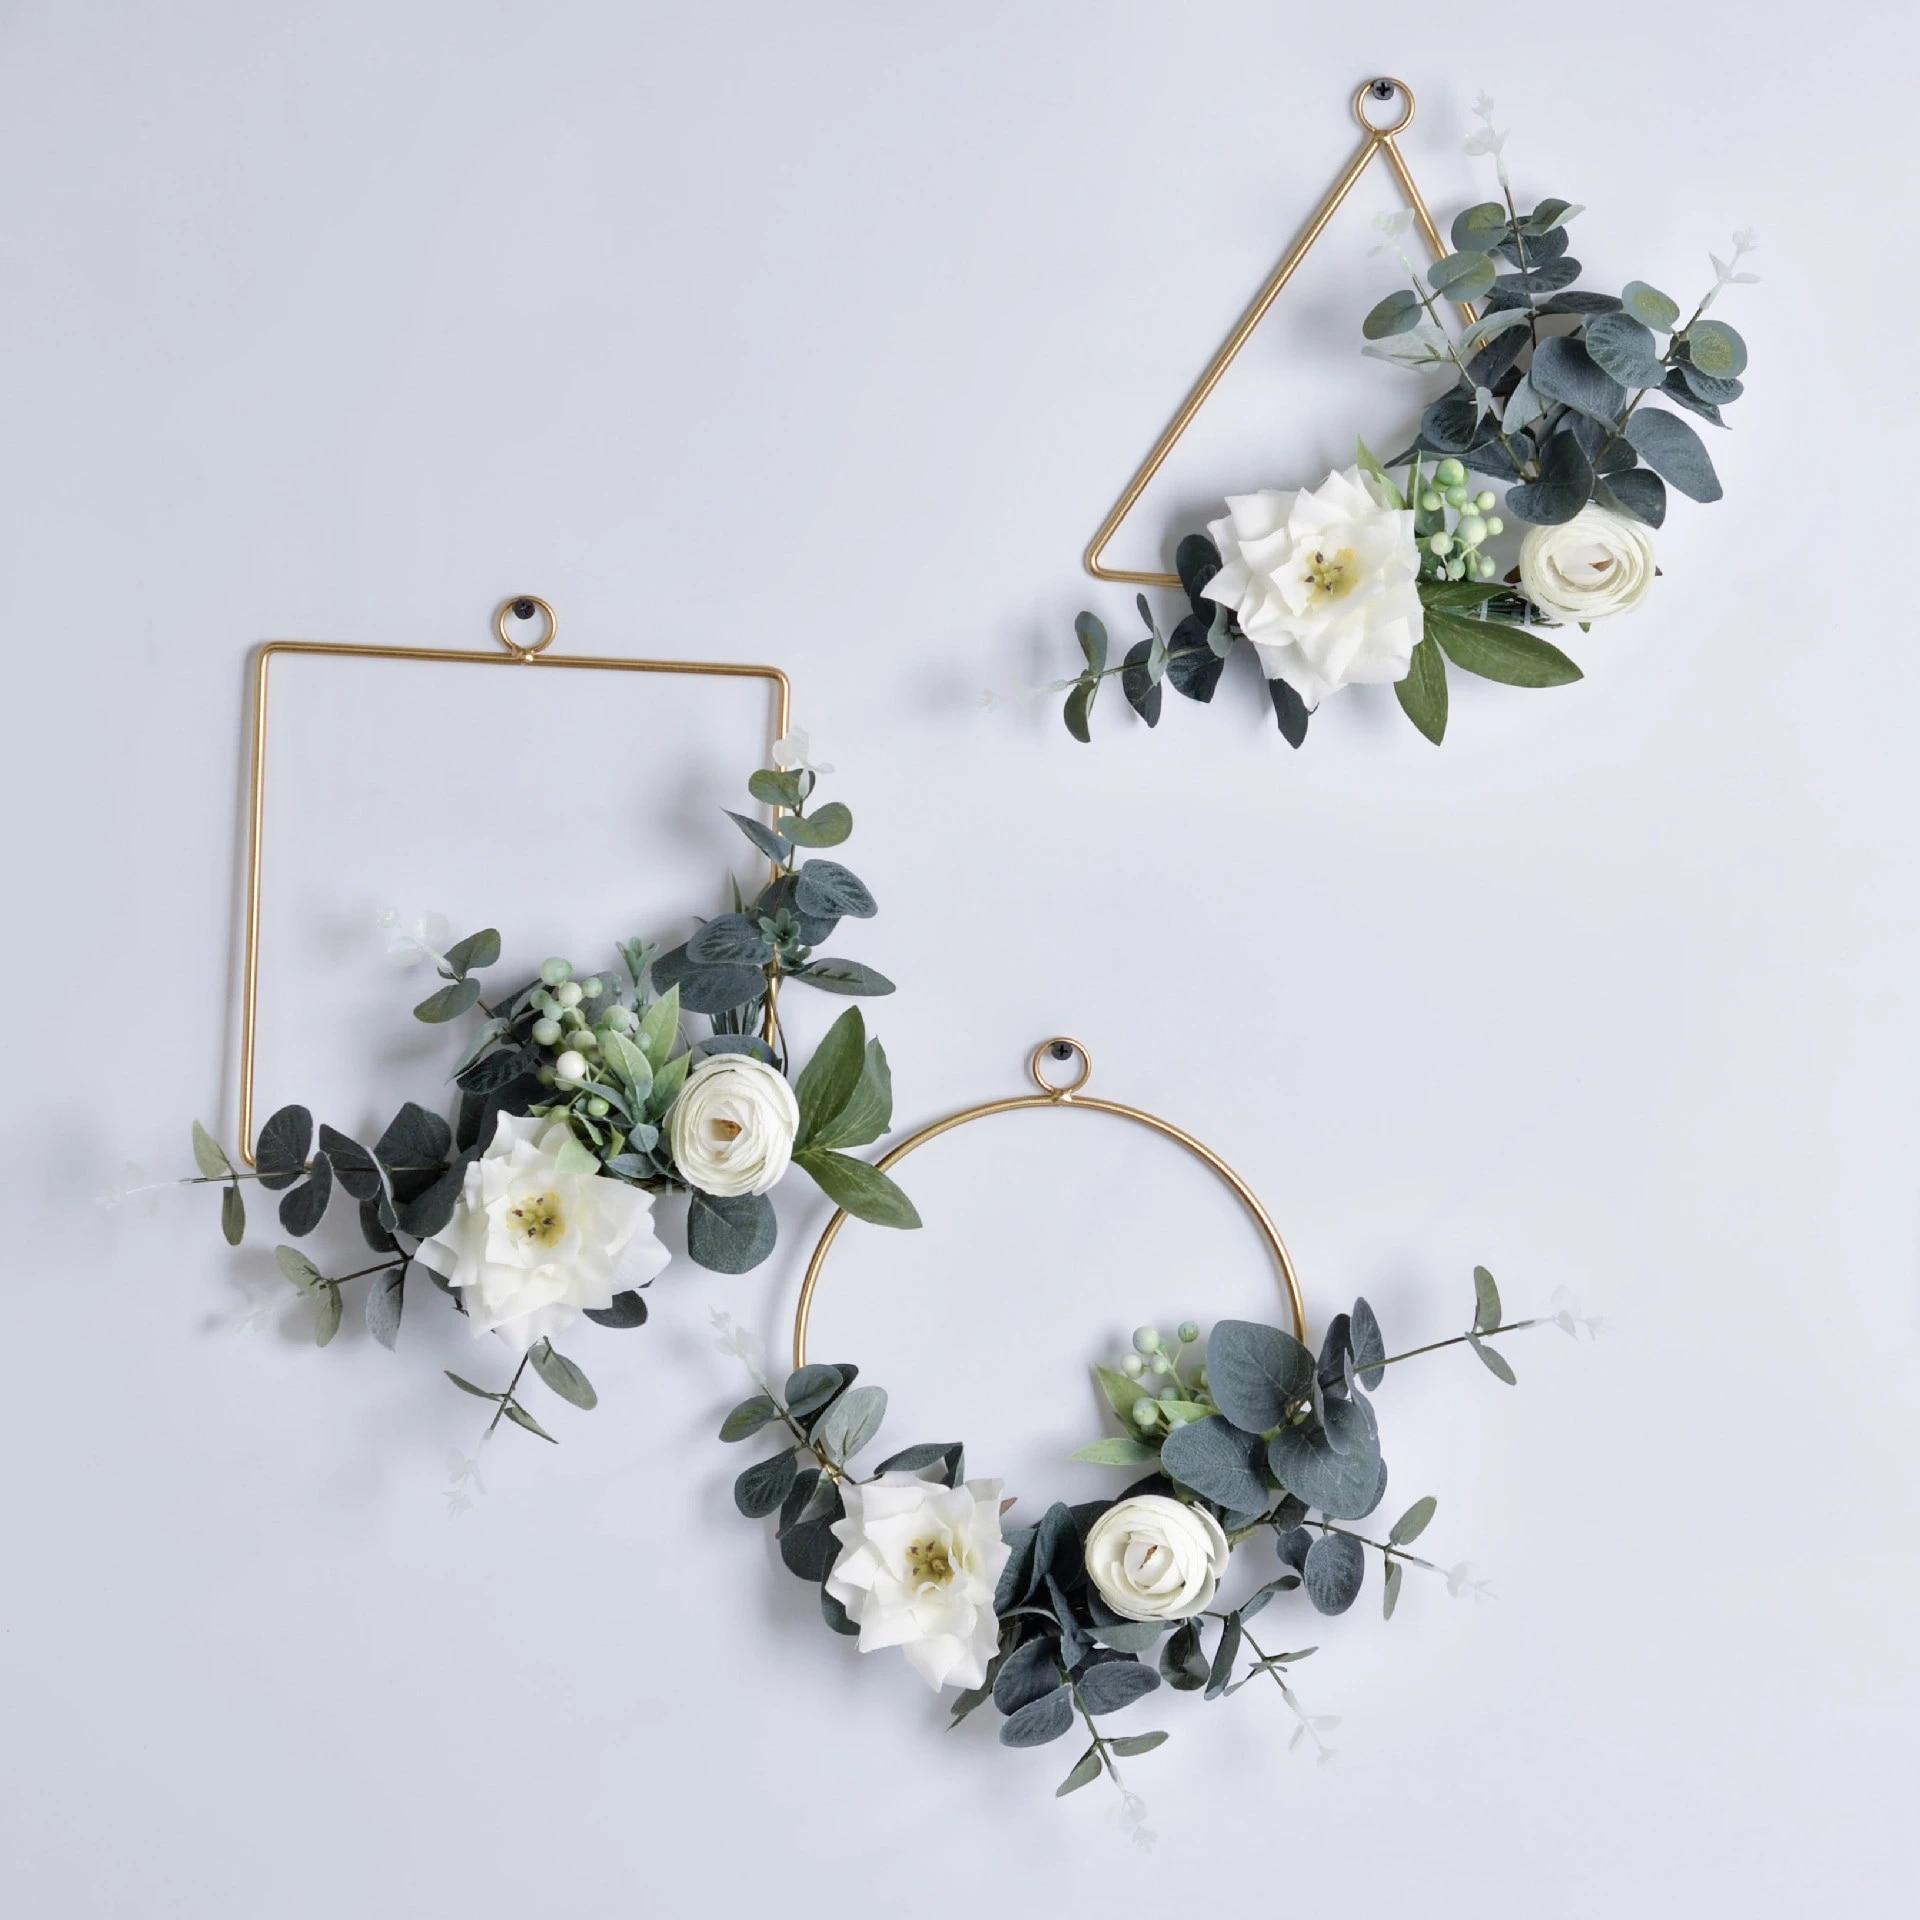 Metal Flower Wreath Ring Floral Hoop Wall Hanging Garland Wedding Party Supplies